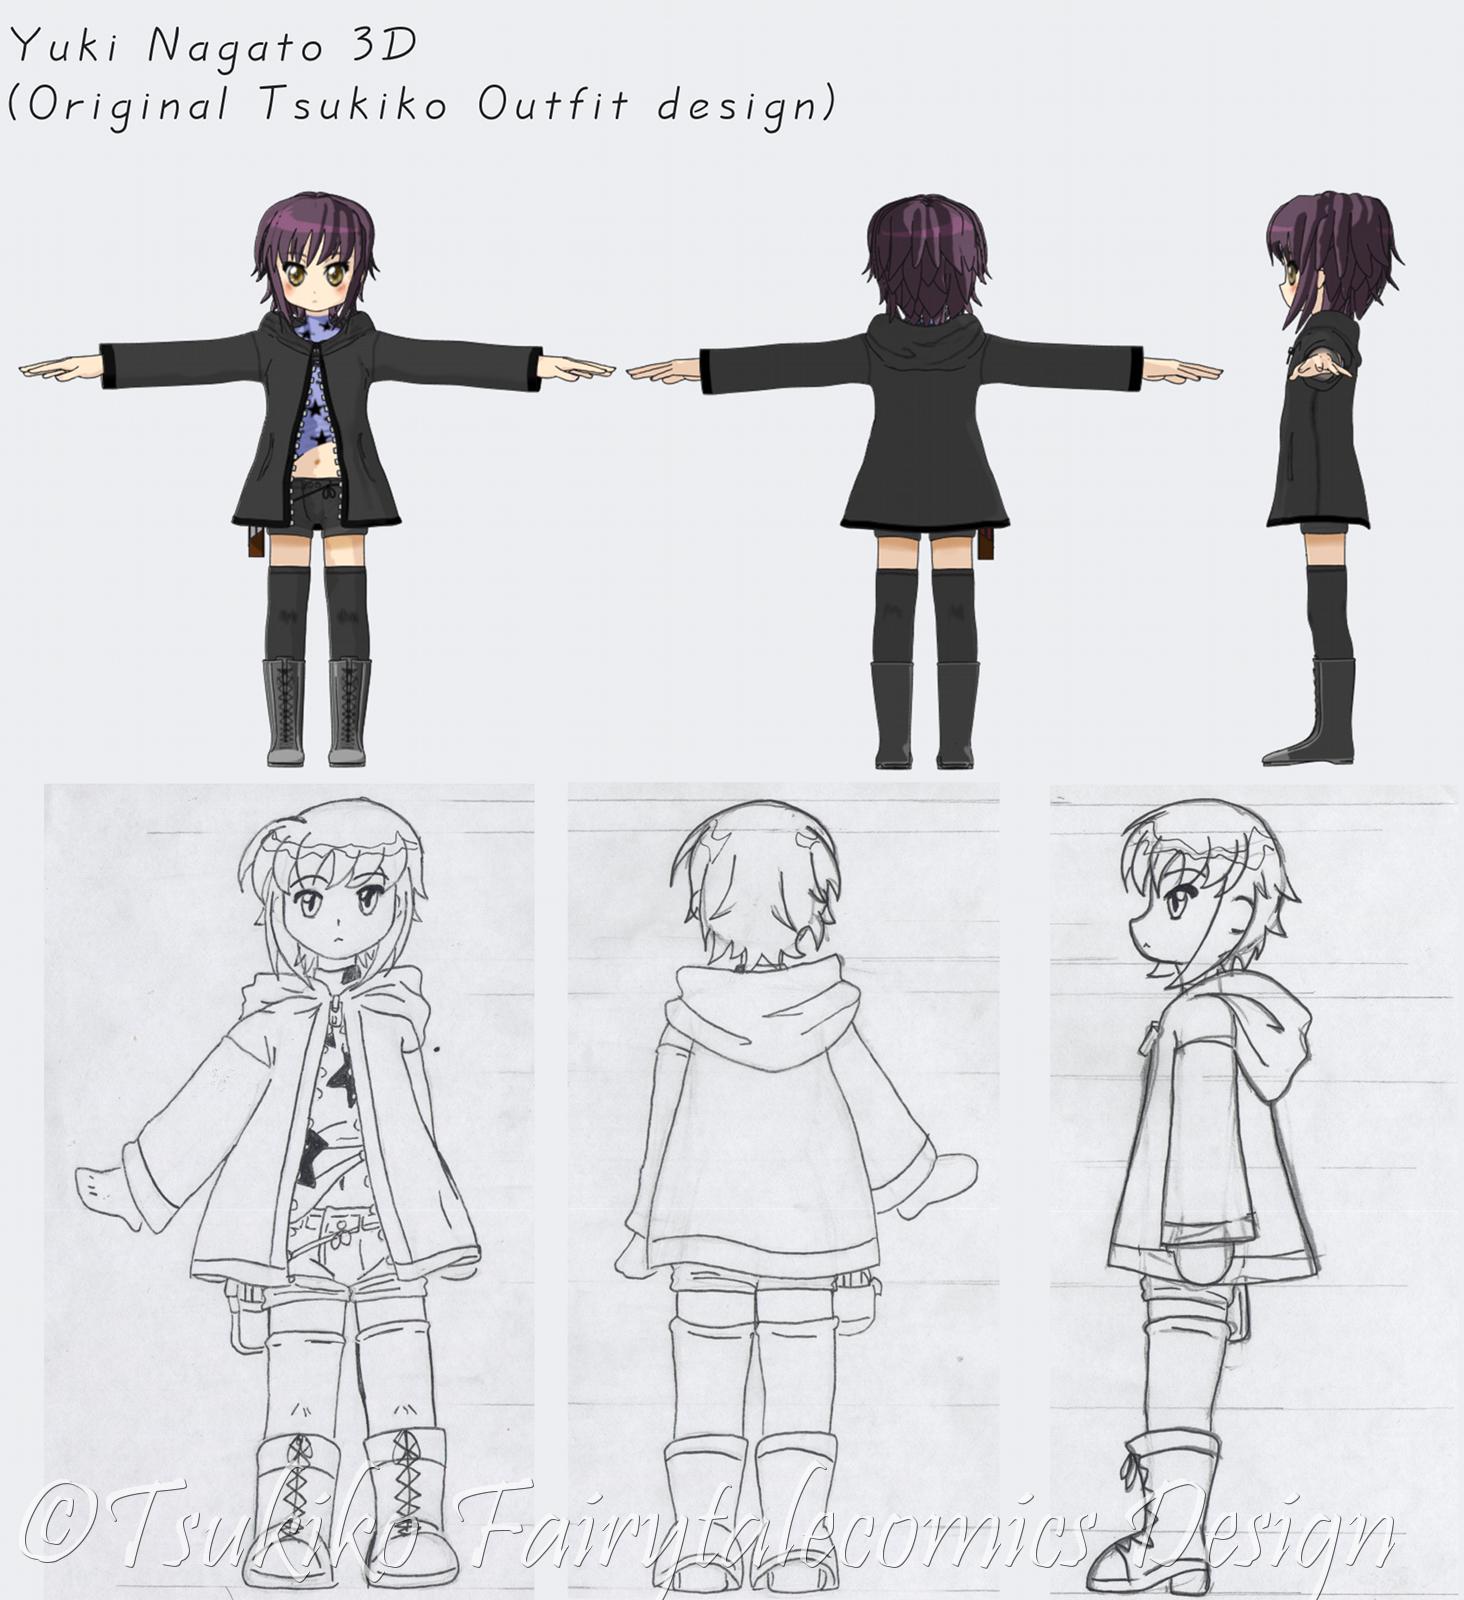 Anime 3d model sheet google search blueprints pinterest 3d 3d malvernweather Images